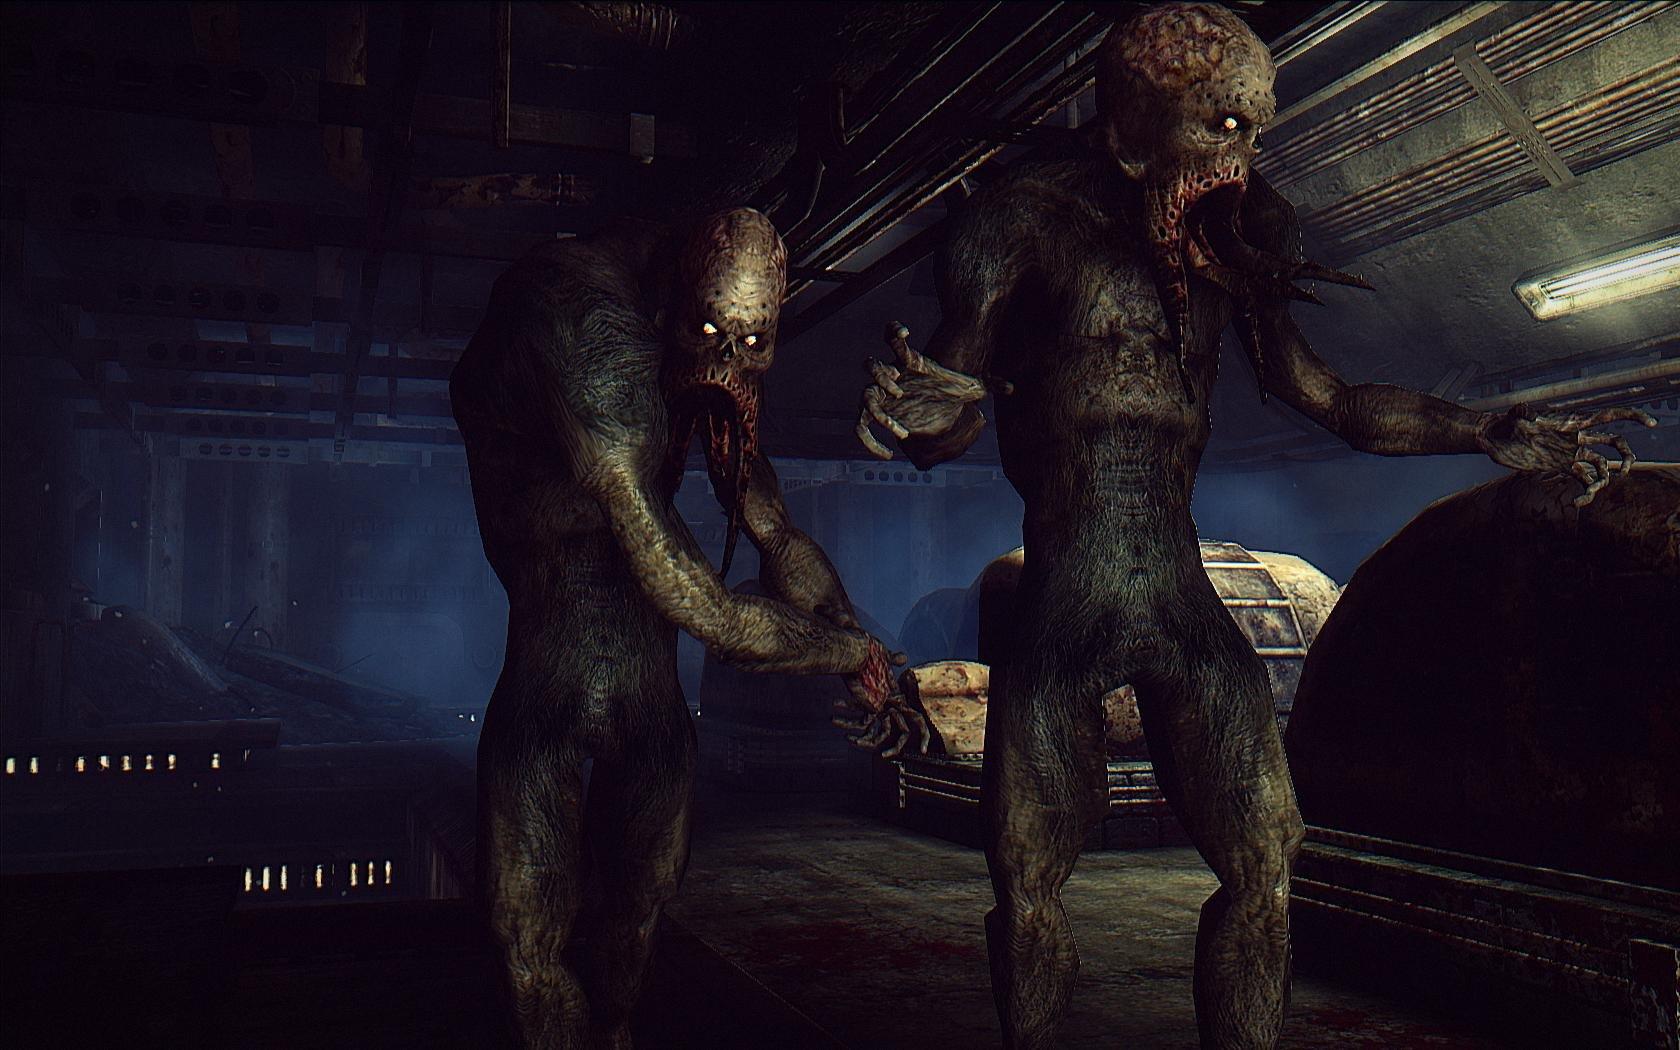 Fallout3 2019-04-12 14-13-32-05